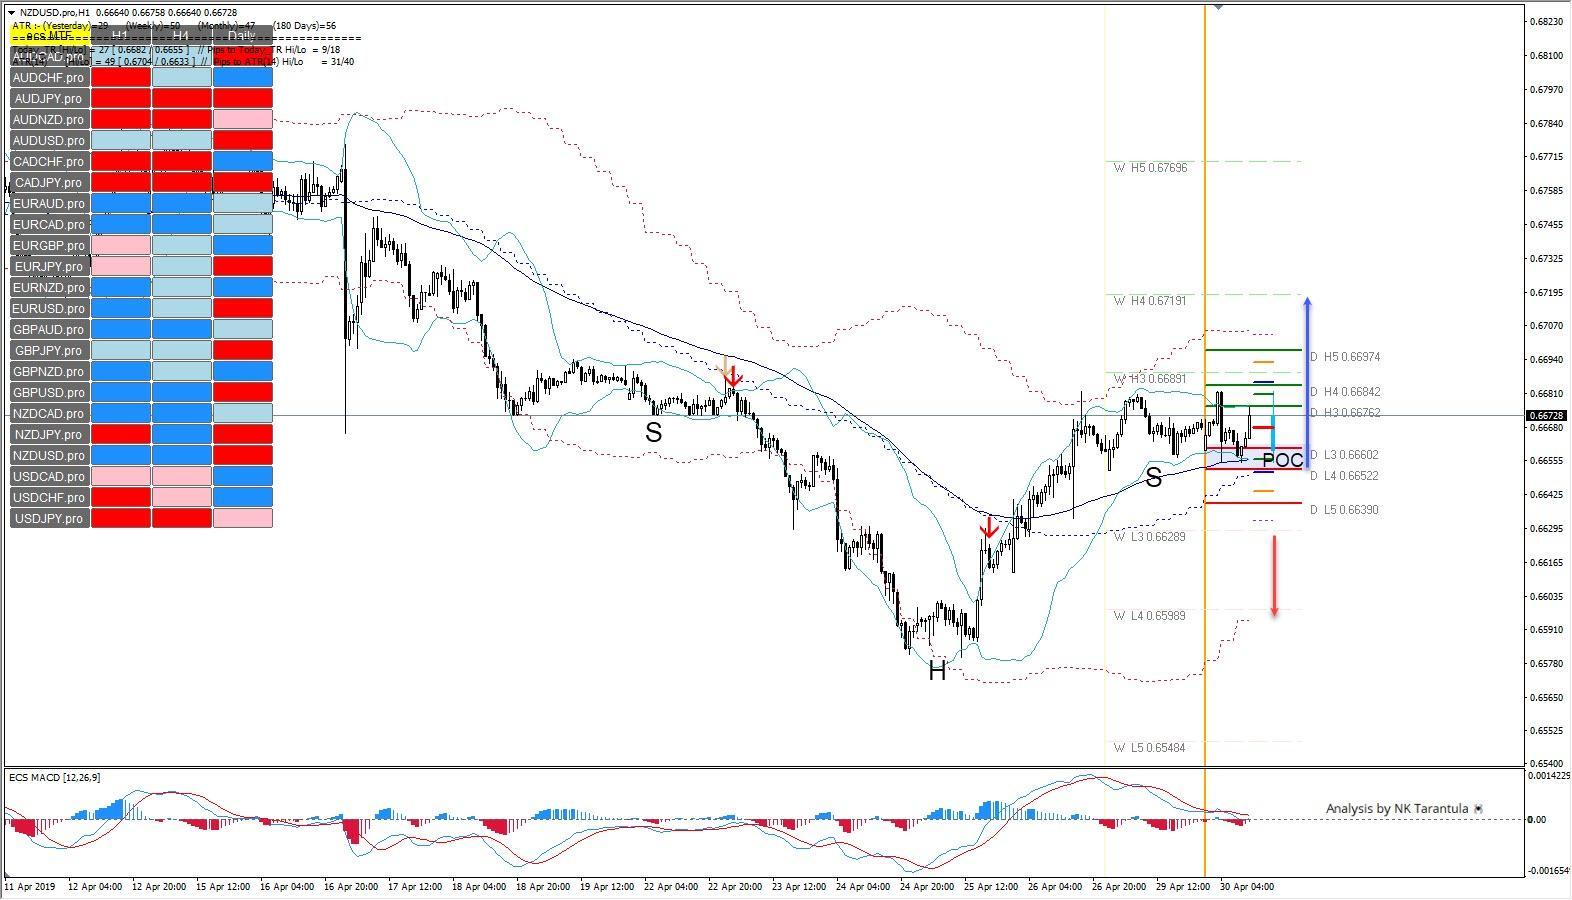 NZD/USD Huge Inverted SHS Pattern Suggests Bullish Reversal